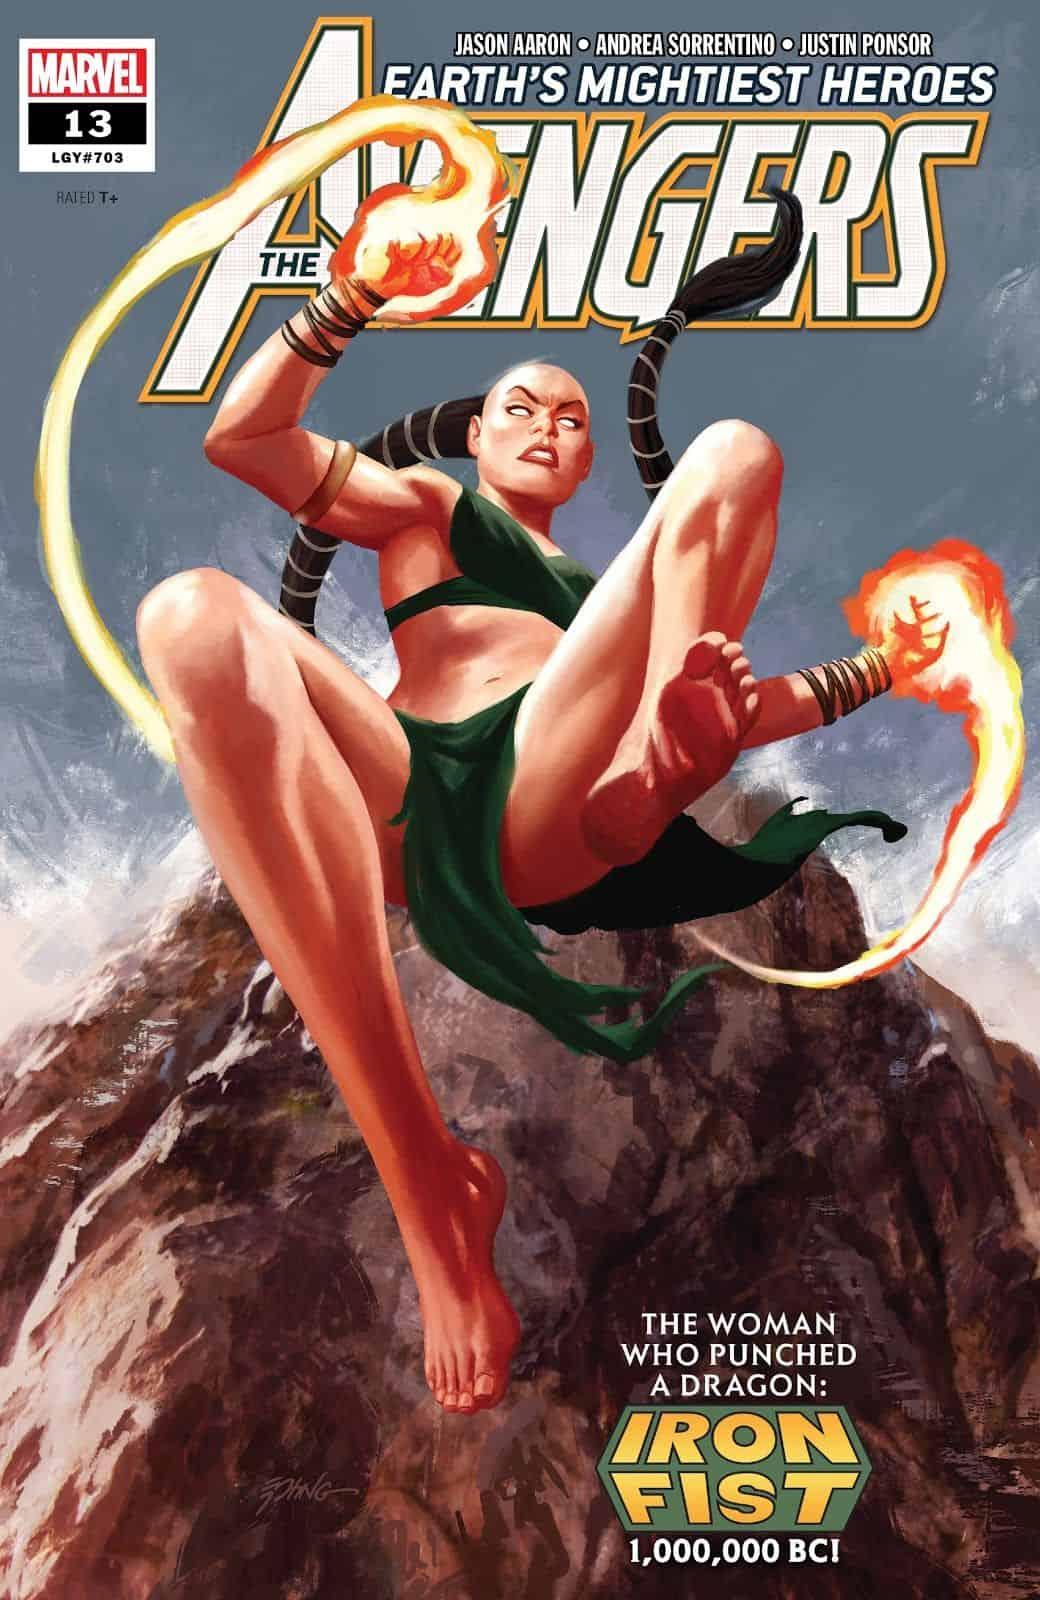 The Avengers: Marvel Comics Universe & Avengers #13 Spoilers: Secret